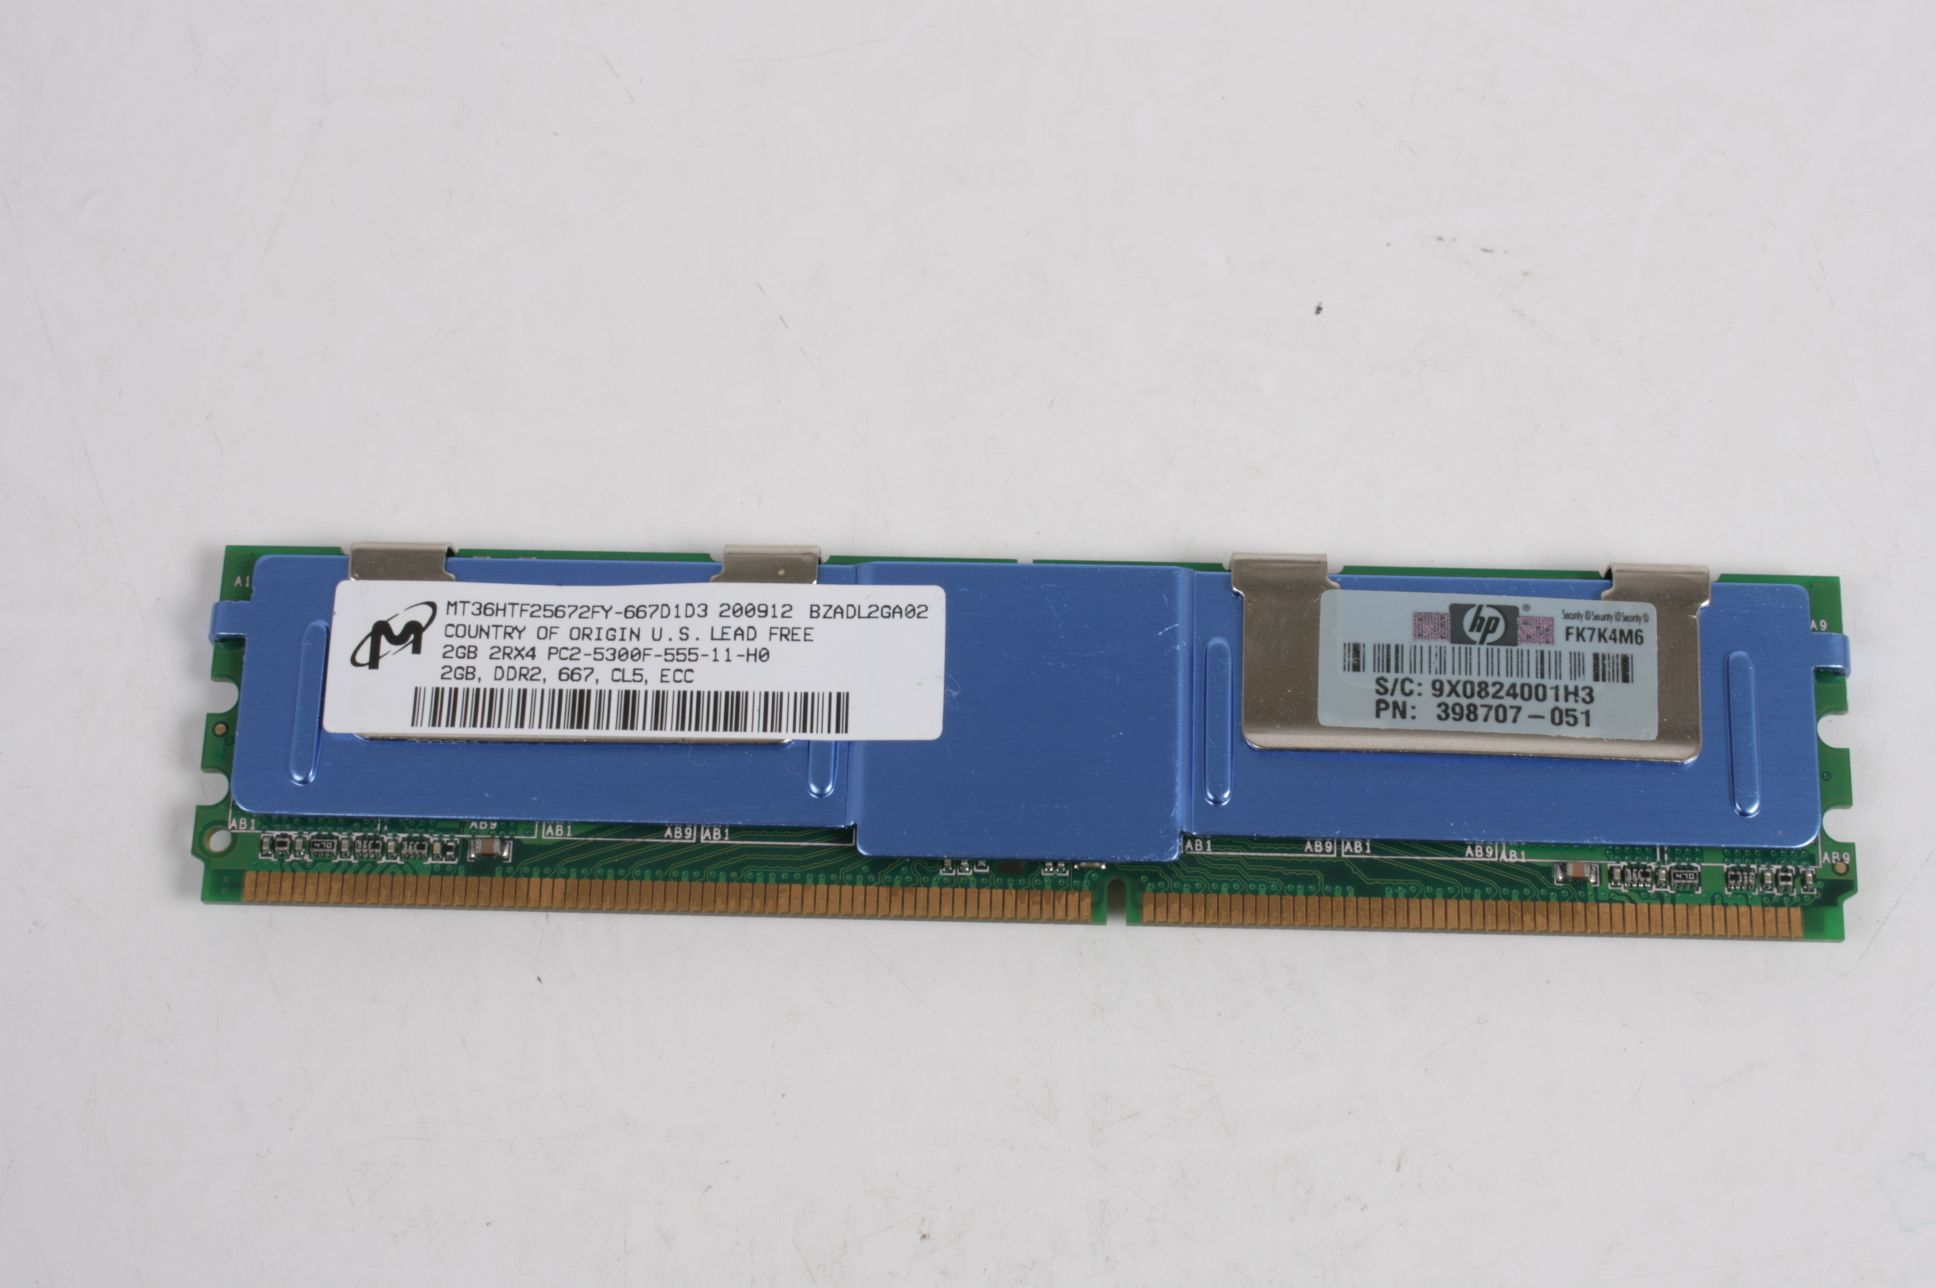 1X 2GB 2RX4 PC2-5300F-555-11-H0 ECC SERVER HP 398707-051 MEMORY  LOT